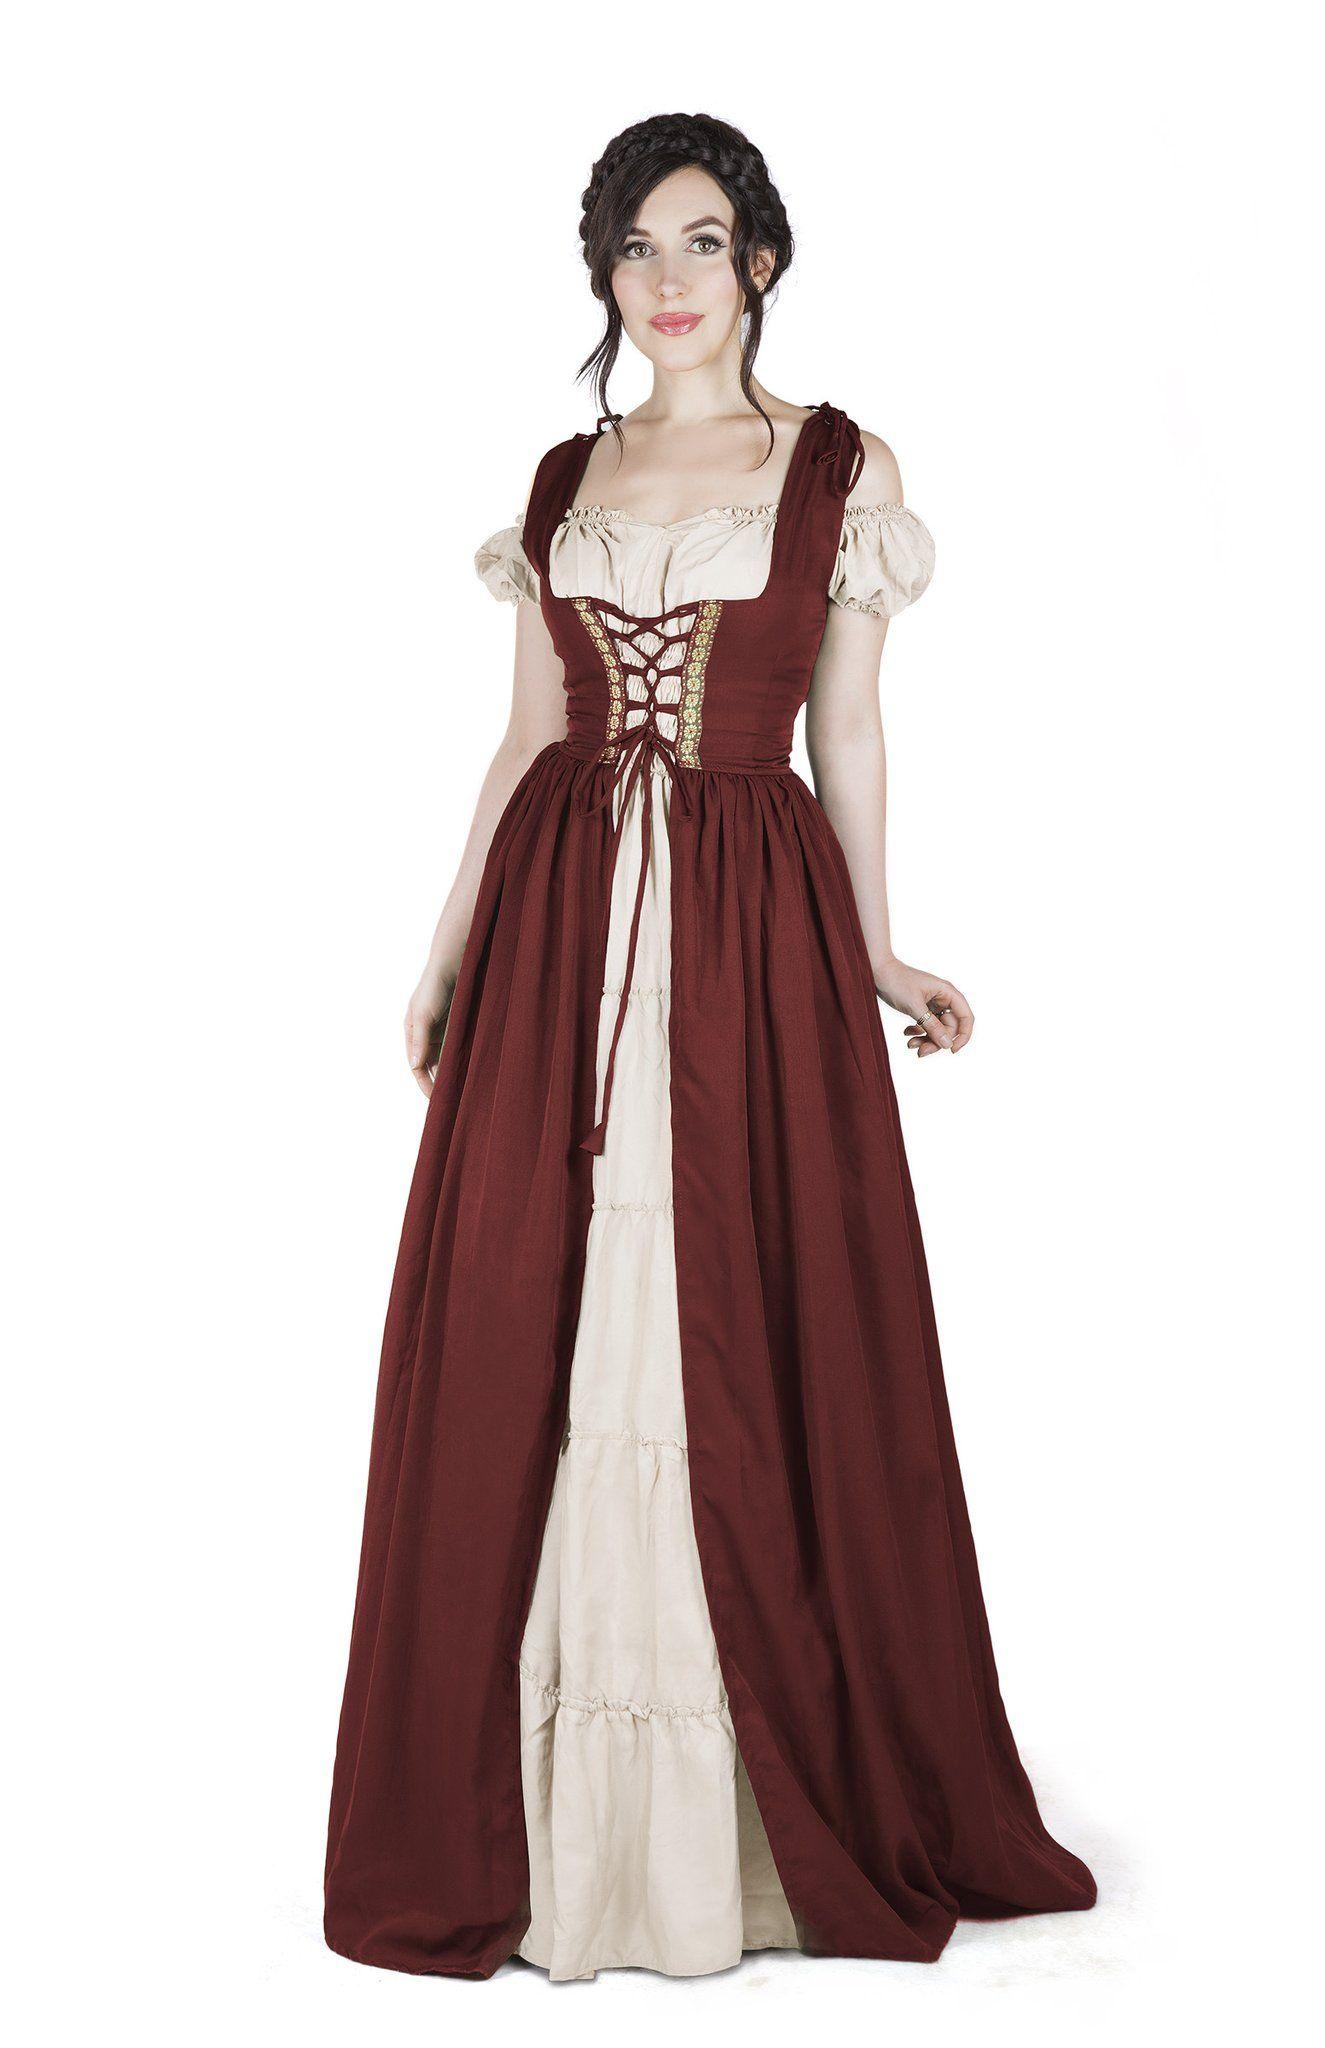 Cotton Renaissance dresses, Medieval dress, Irish costumes